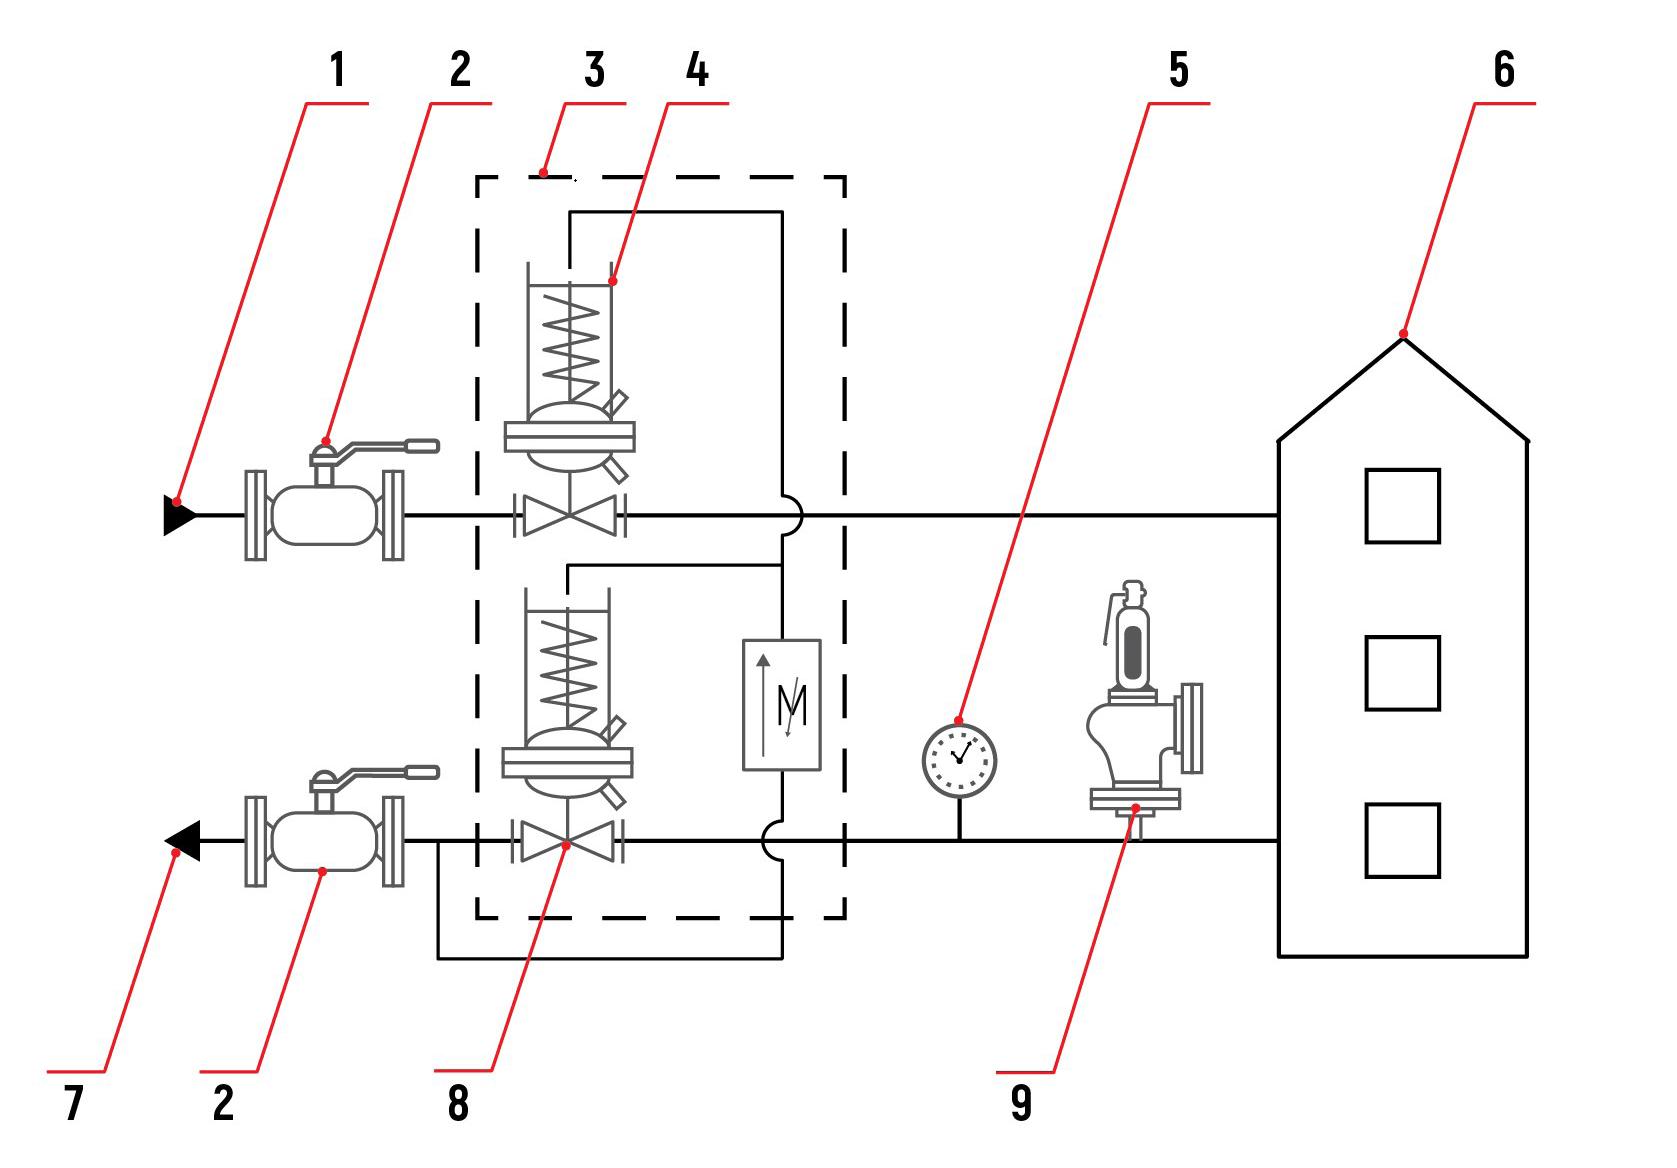 Монтаж устройства (АЗТП) cхема подключения